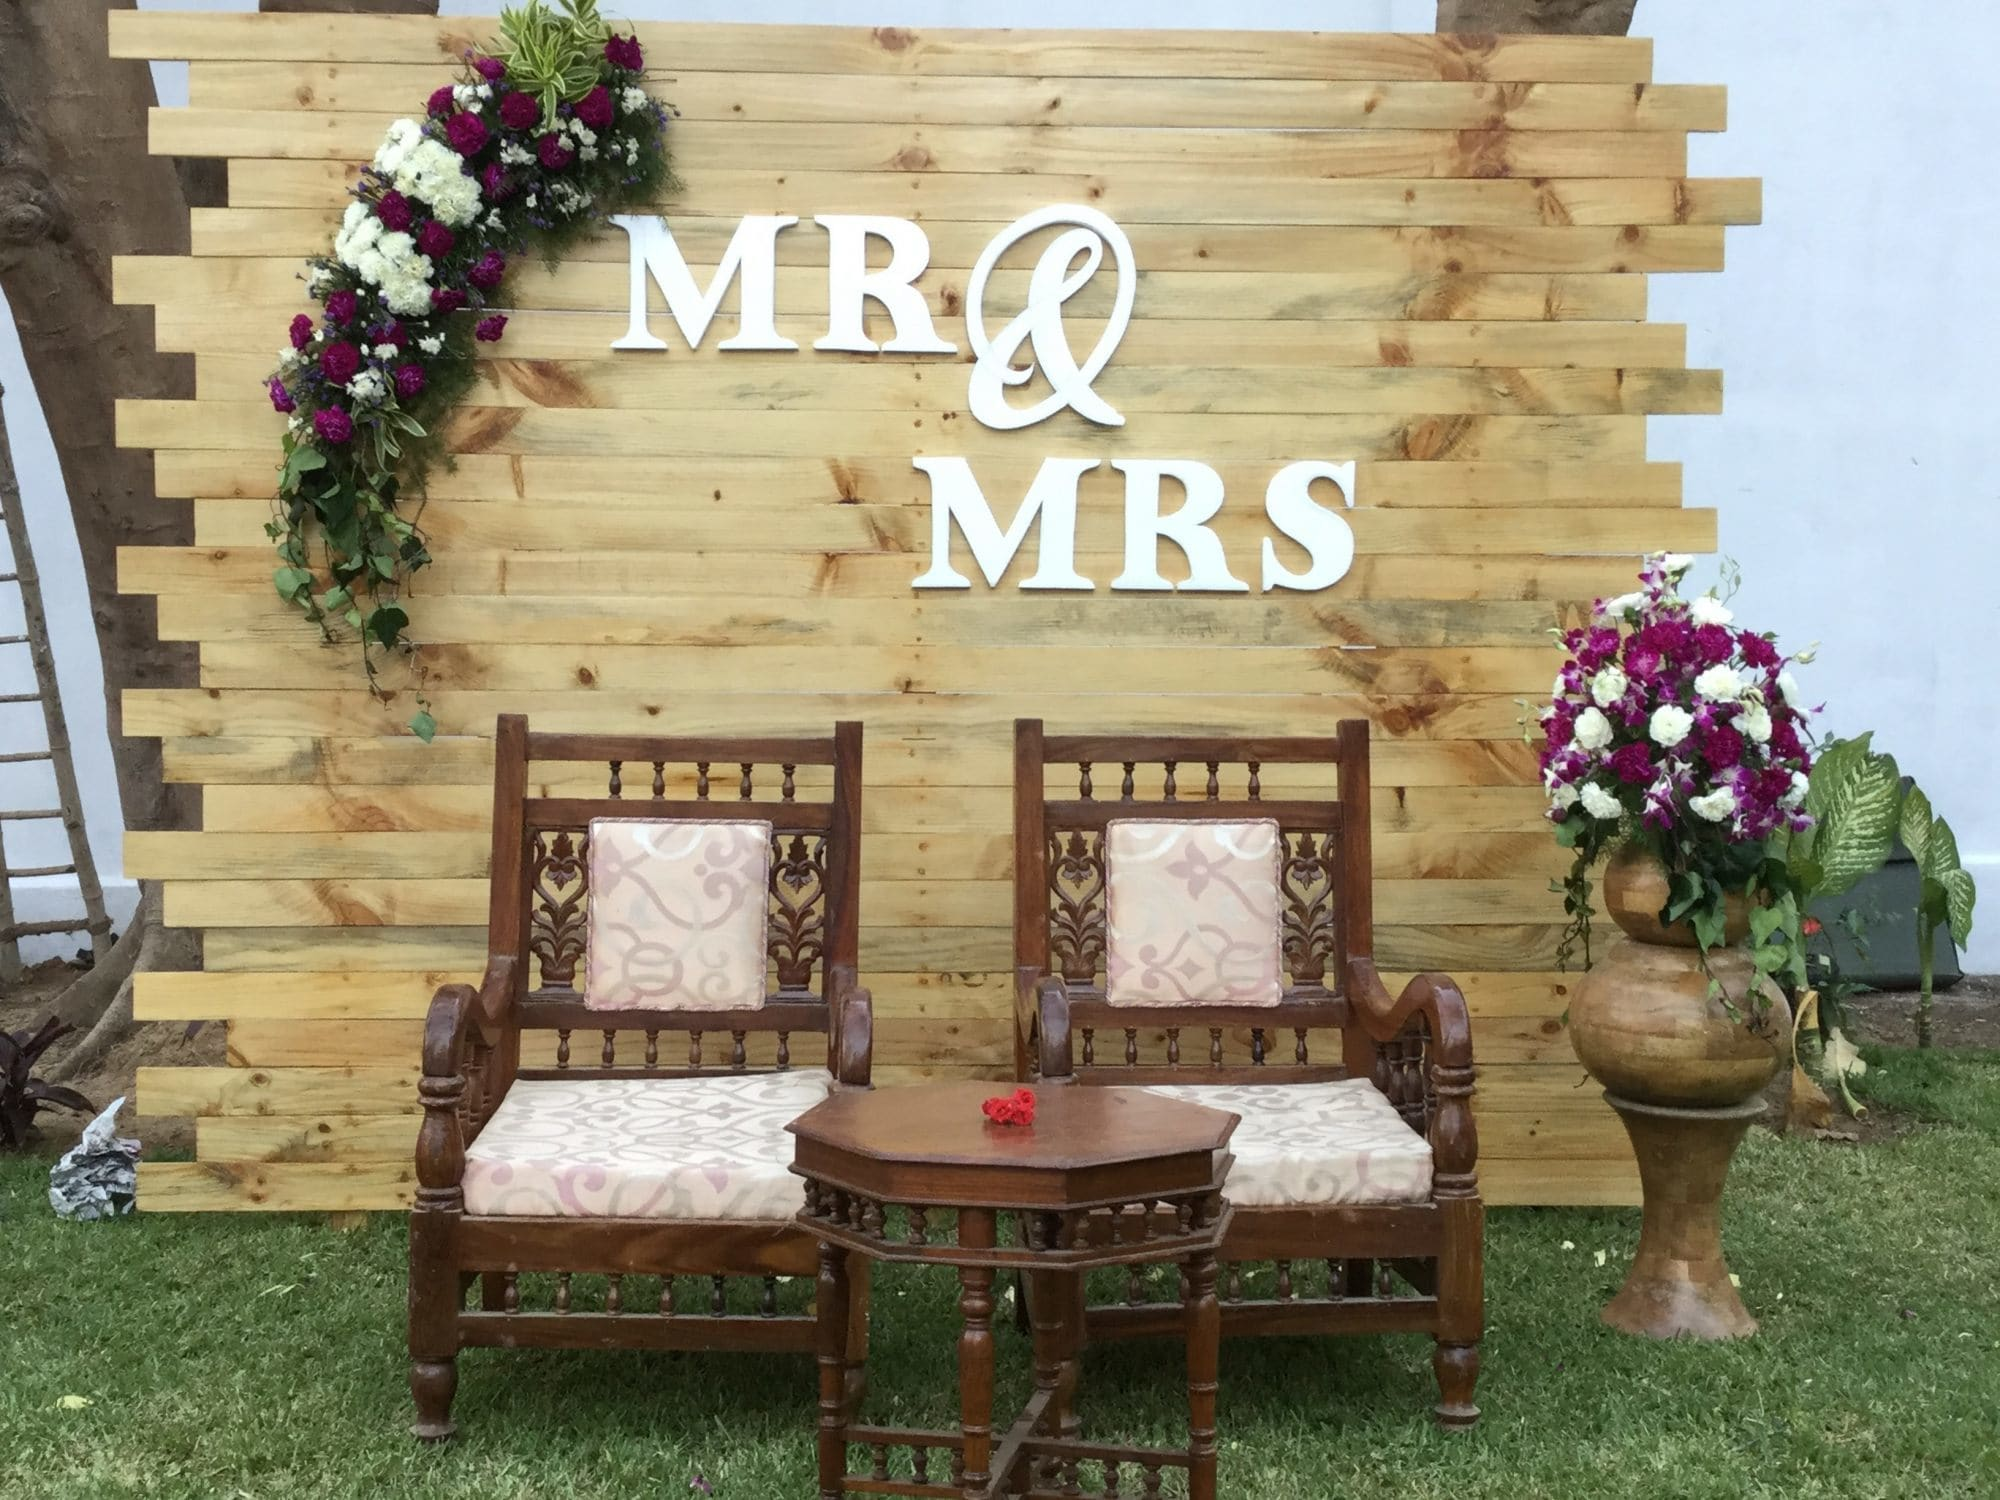 Top 100 wedding decorators in chennai best marriage decorators wedding decorators chennai junglespirit Gallery